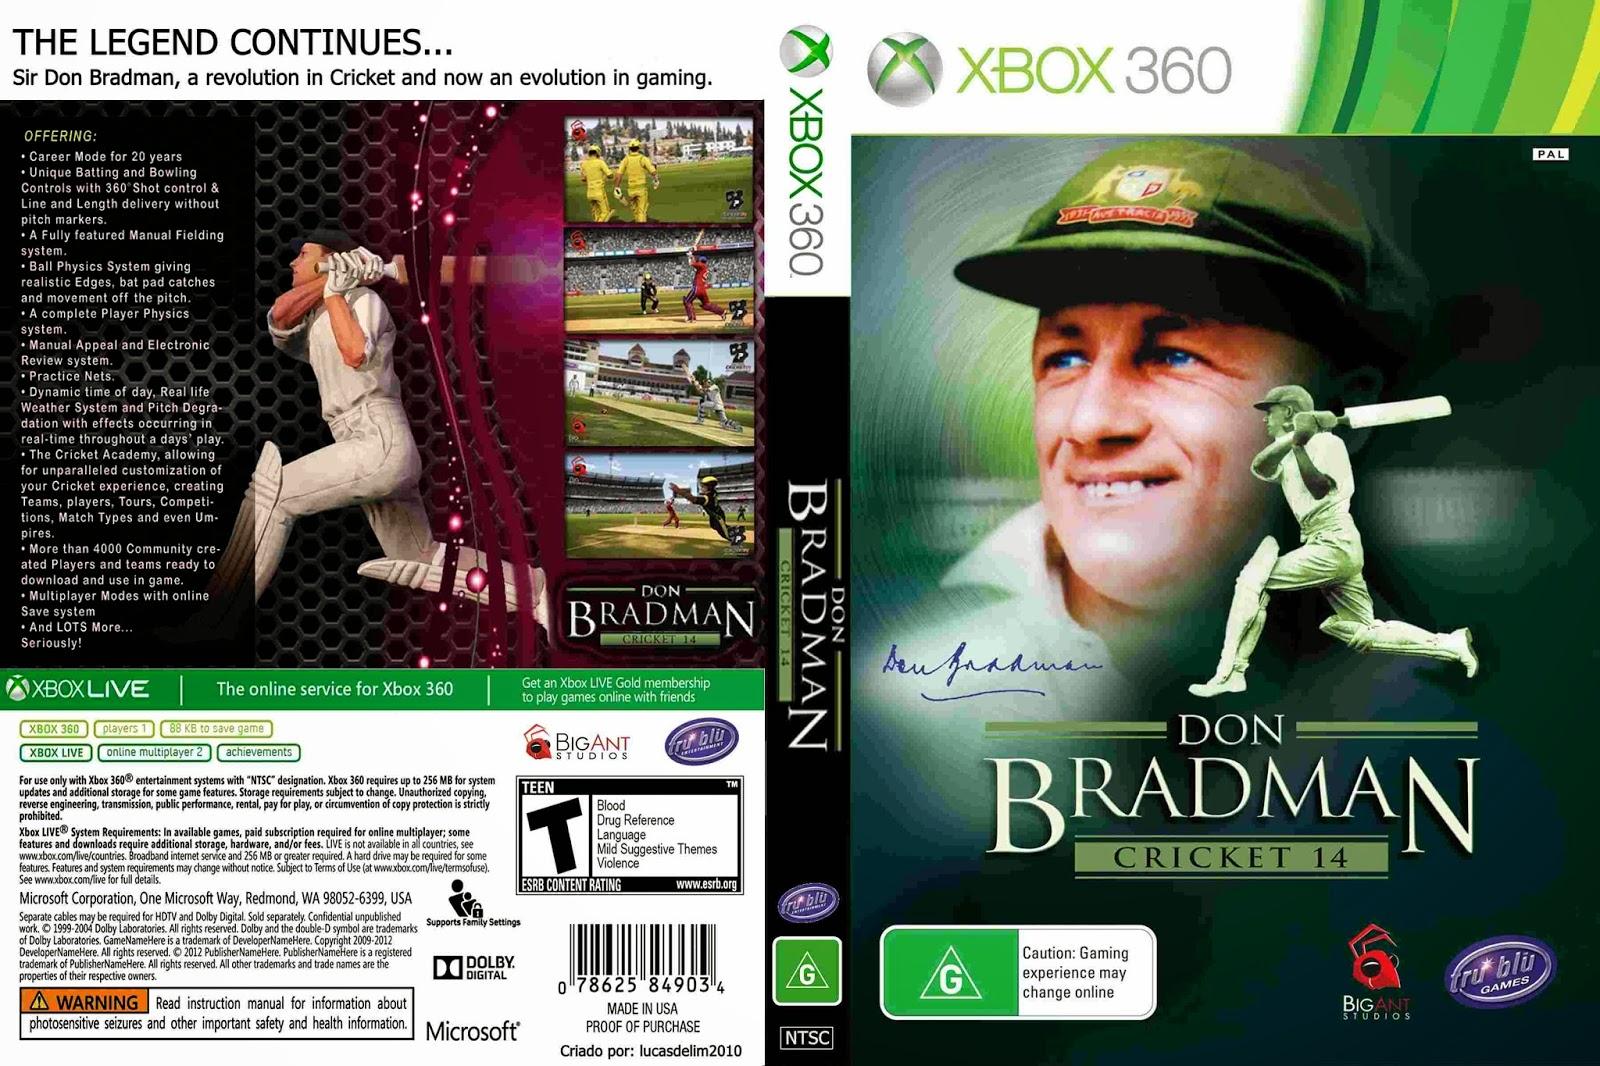 Don Bradman Cricket 14 (2014) - Capa Game XBox 360